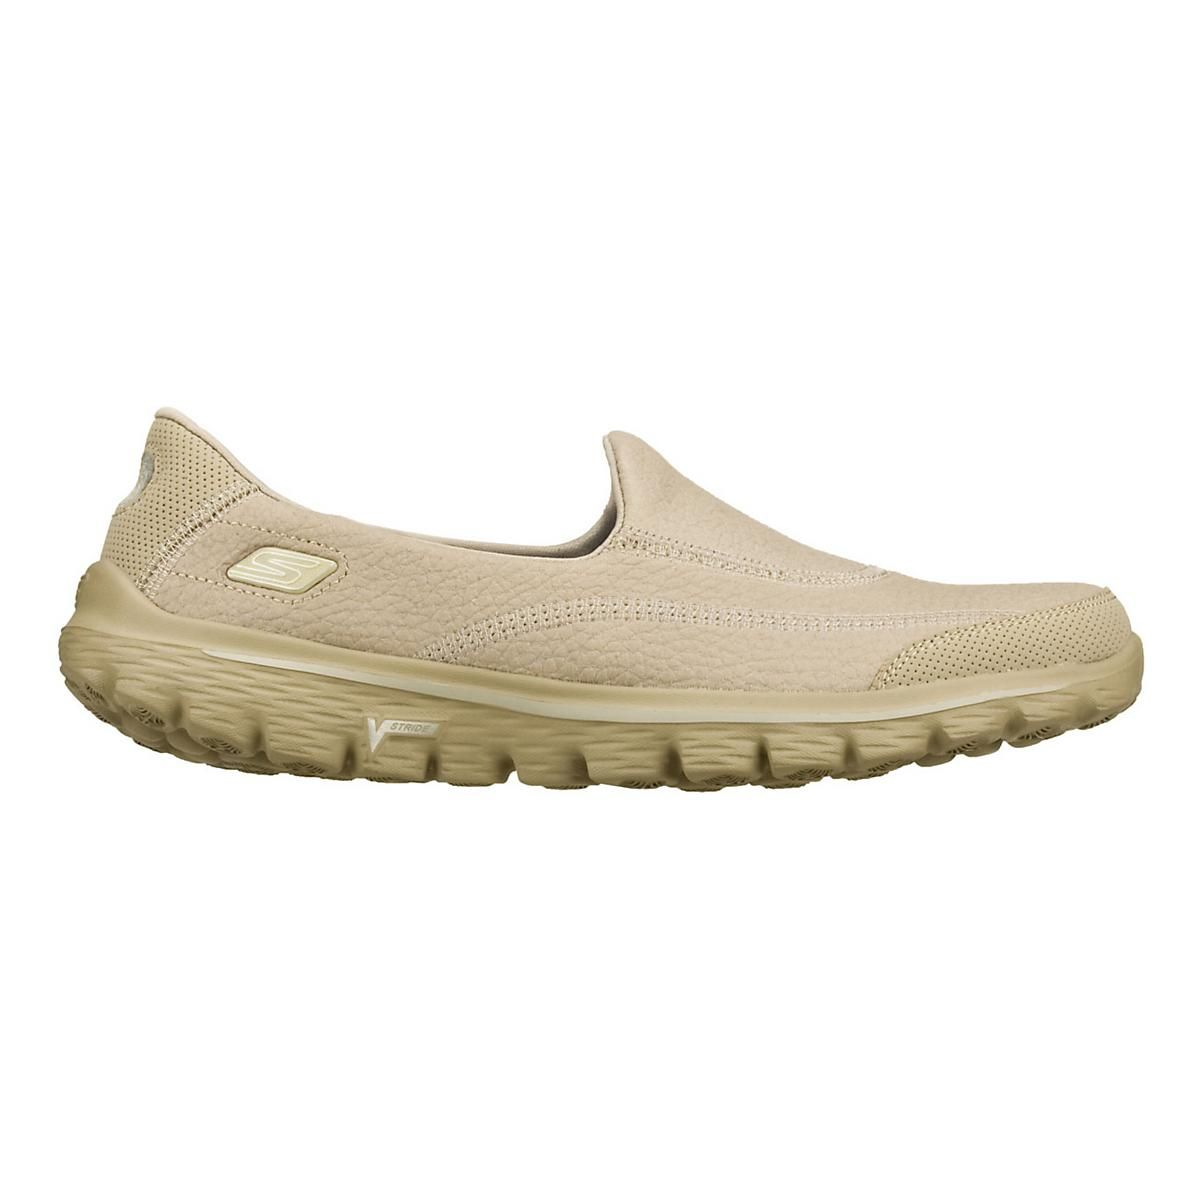 GO Walk 2 Spark Skechers, Skechers mens shoes